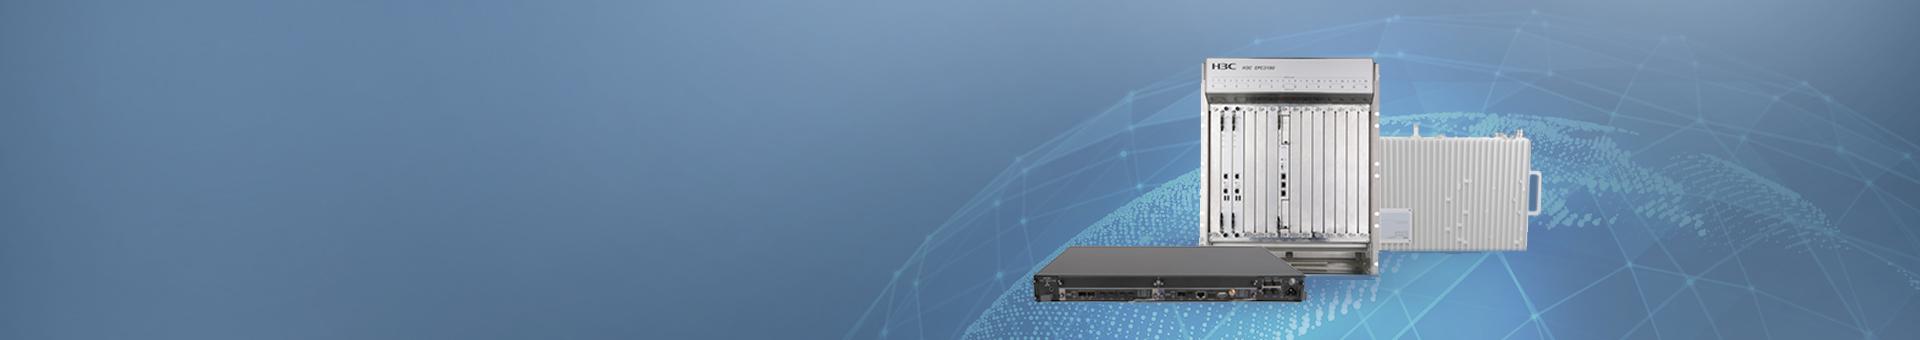 LTE无线专网